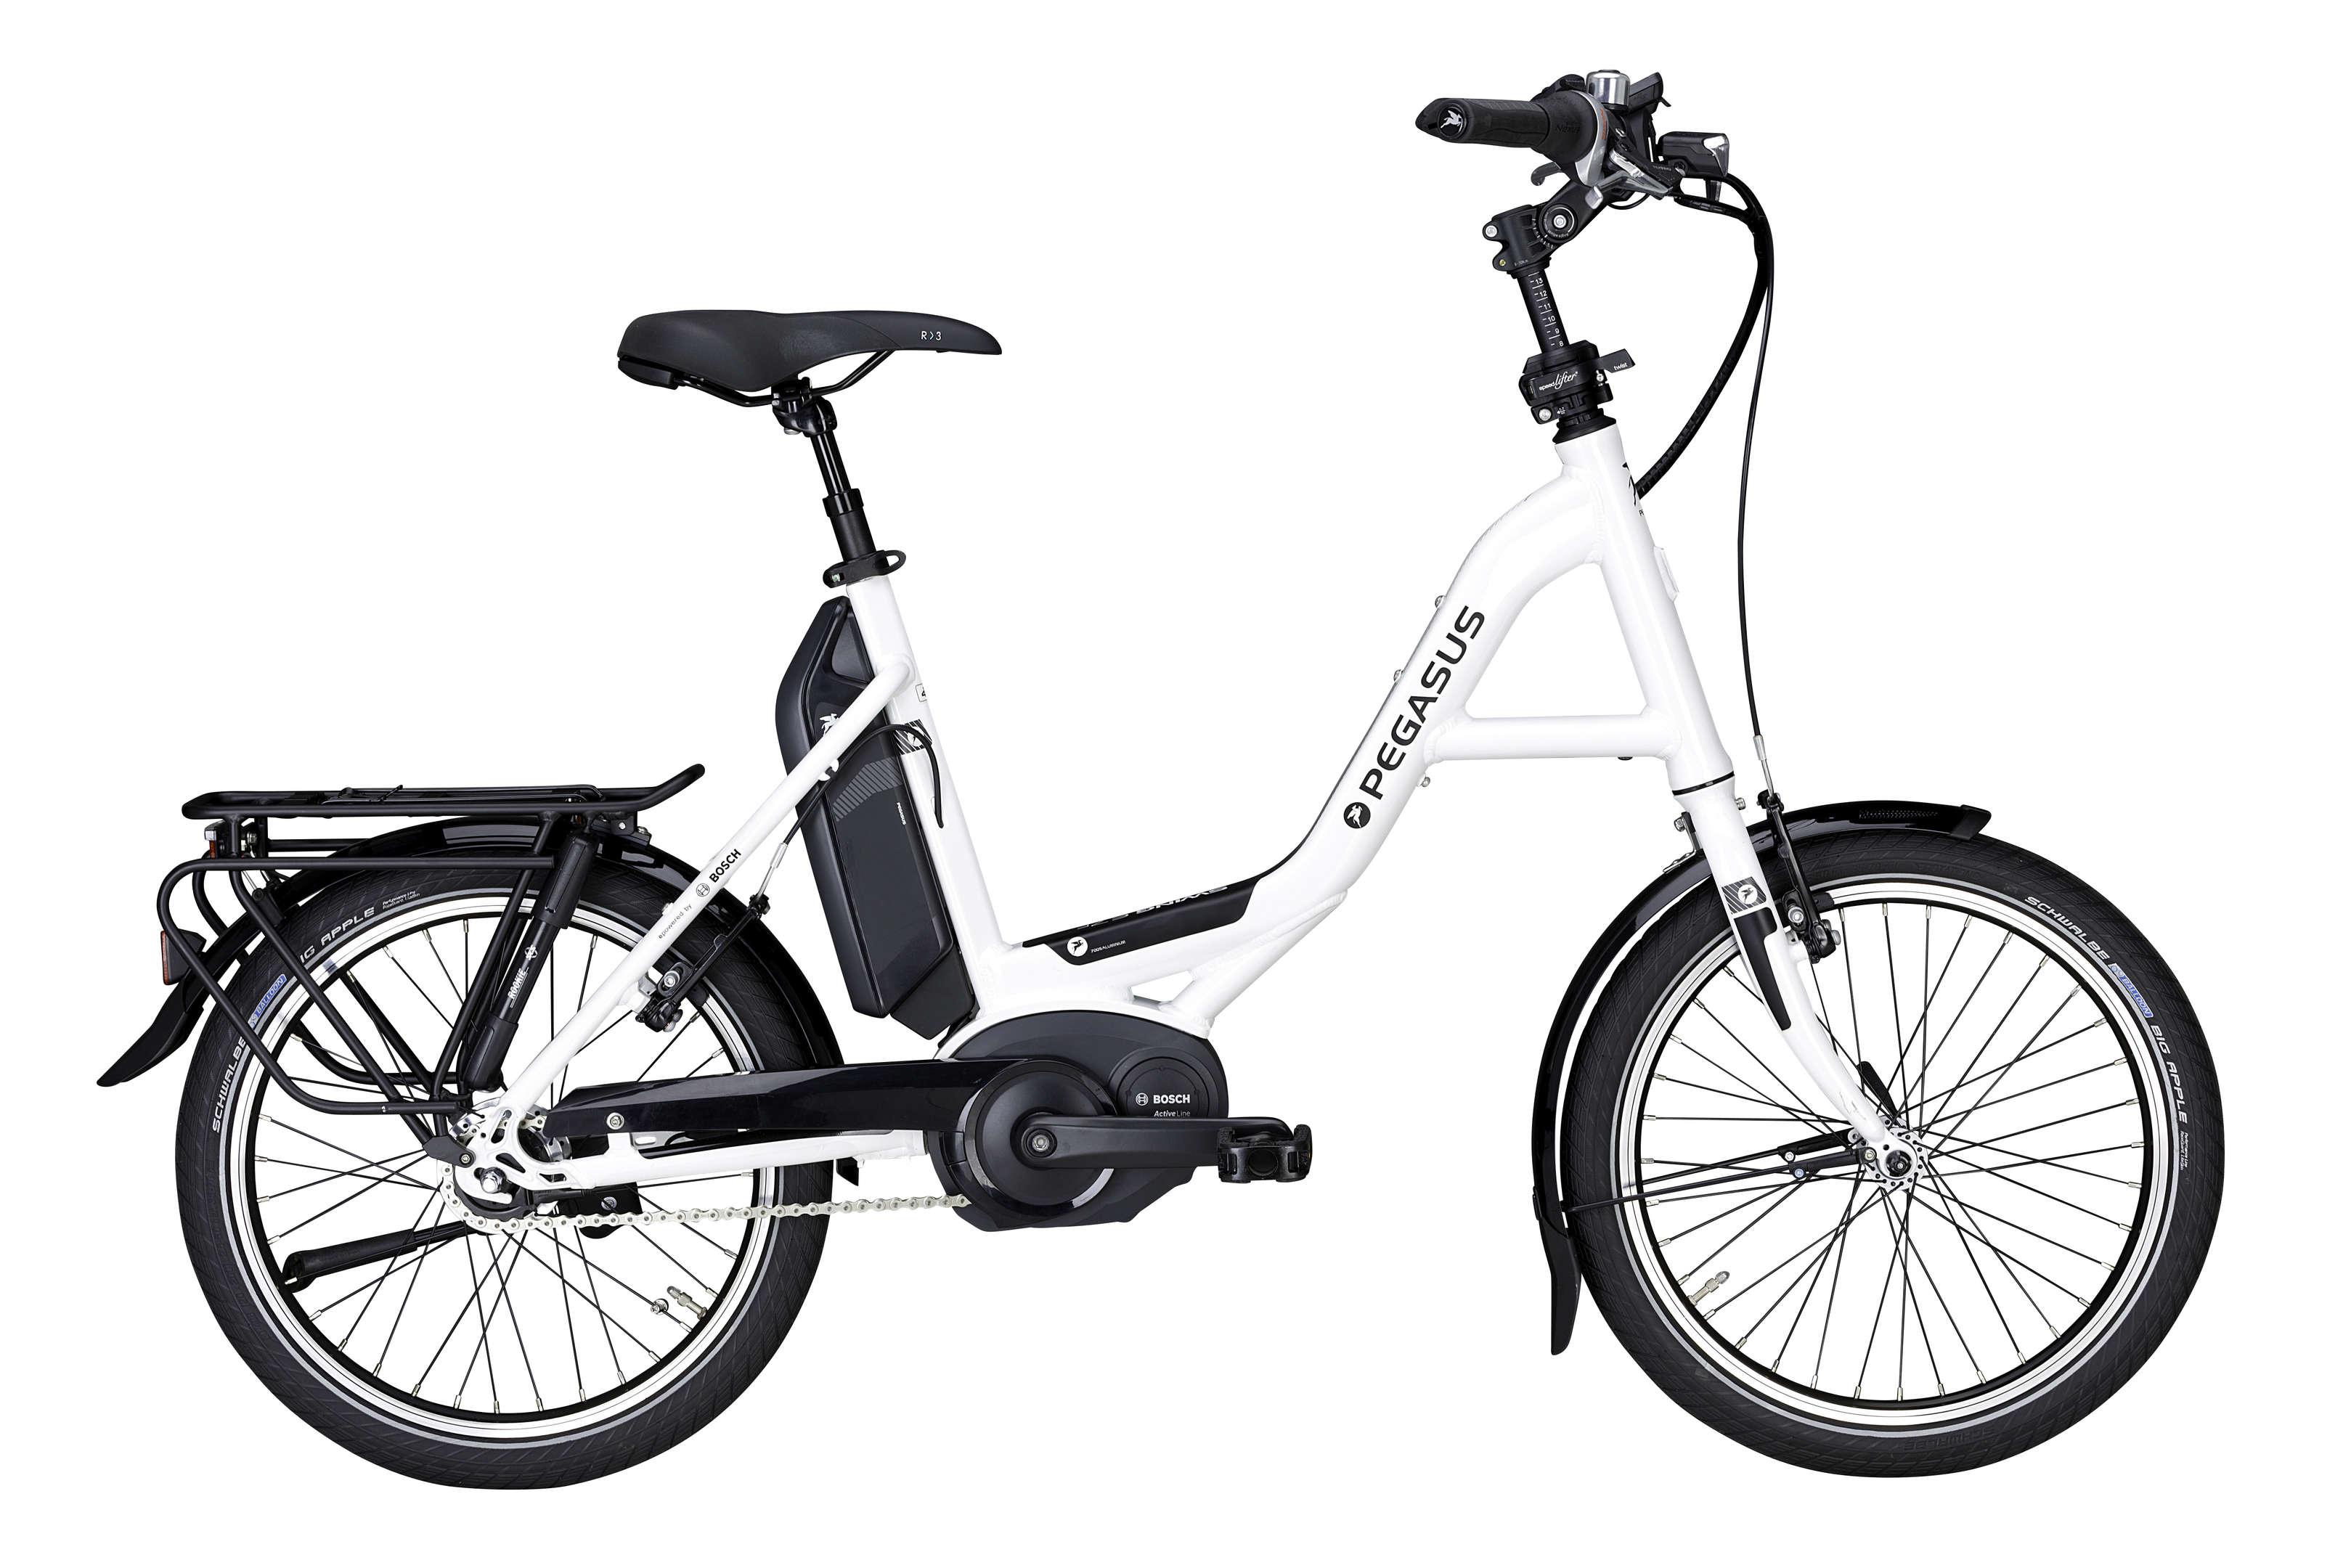 pegasus e bike swing e7f 20 eurorad bikeleasingeurorad. Black Bedroom Furniture Sets. Home Design Ideas